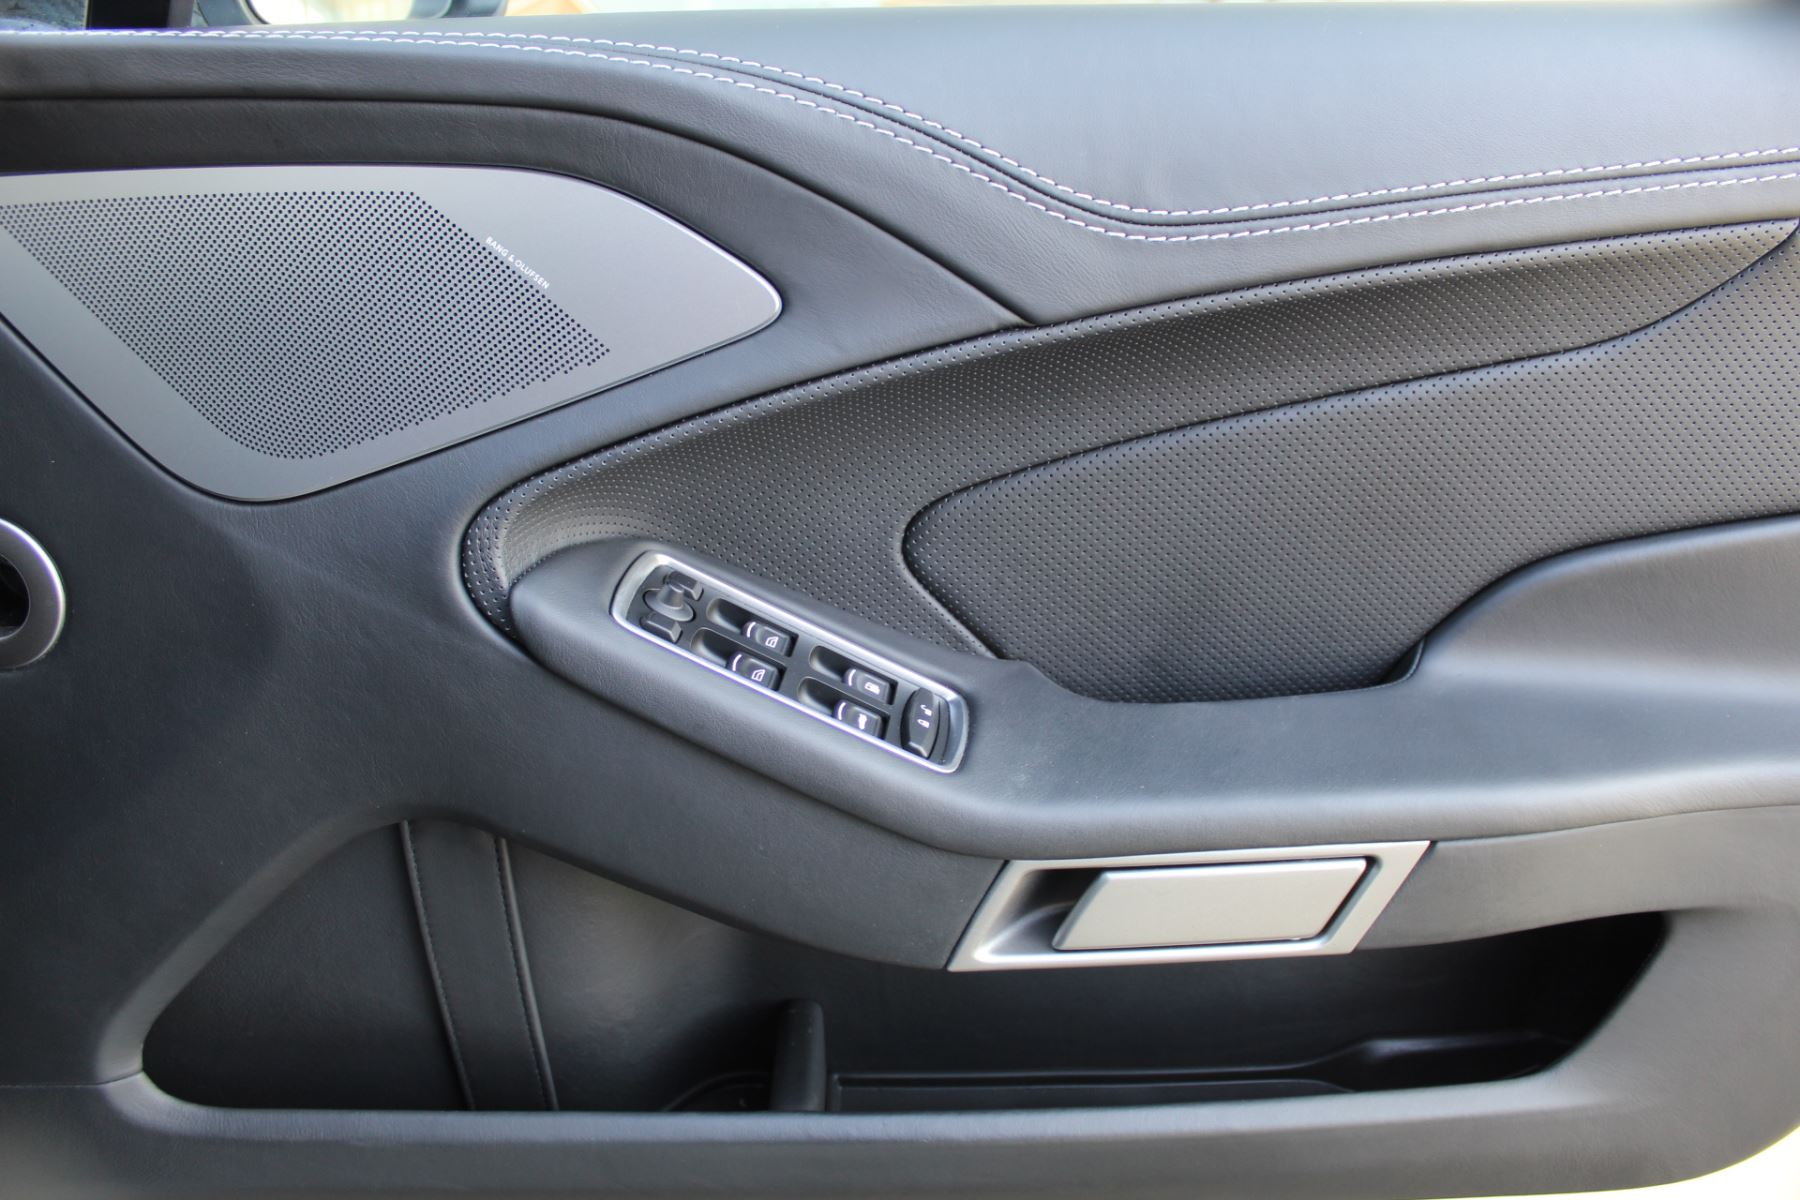 Aston Martin Vanquish V12 [568] 2+2 2dr Touchtronic image 14